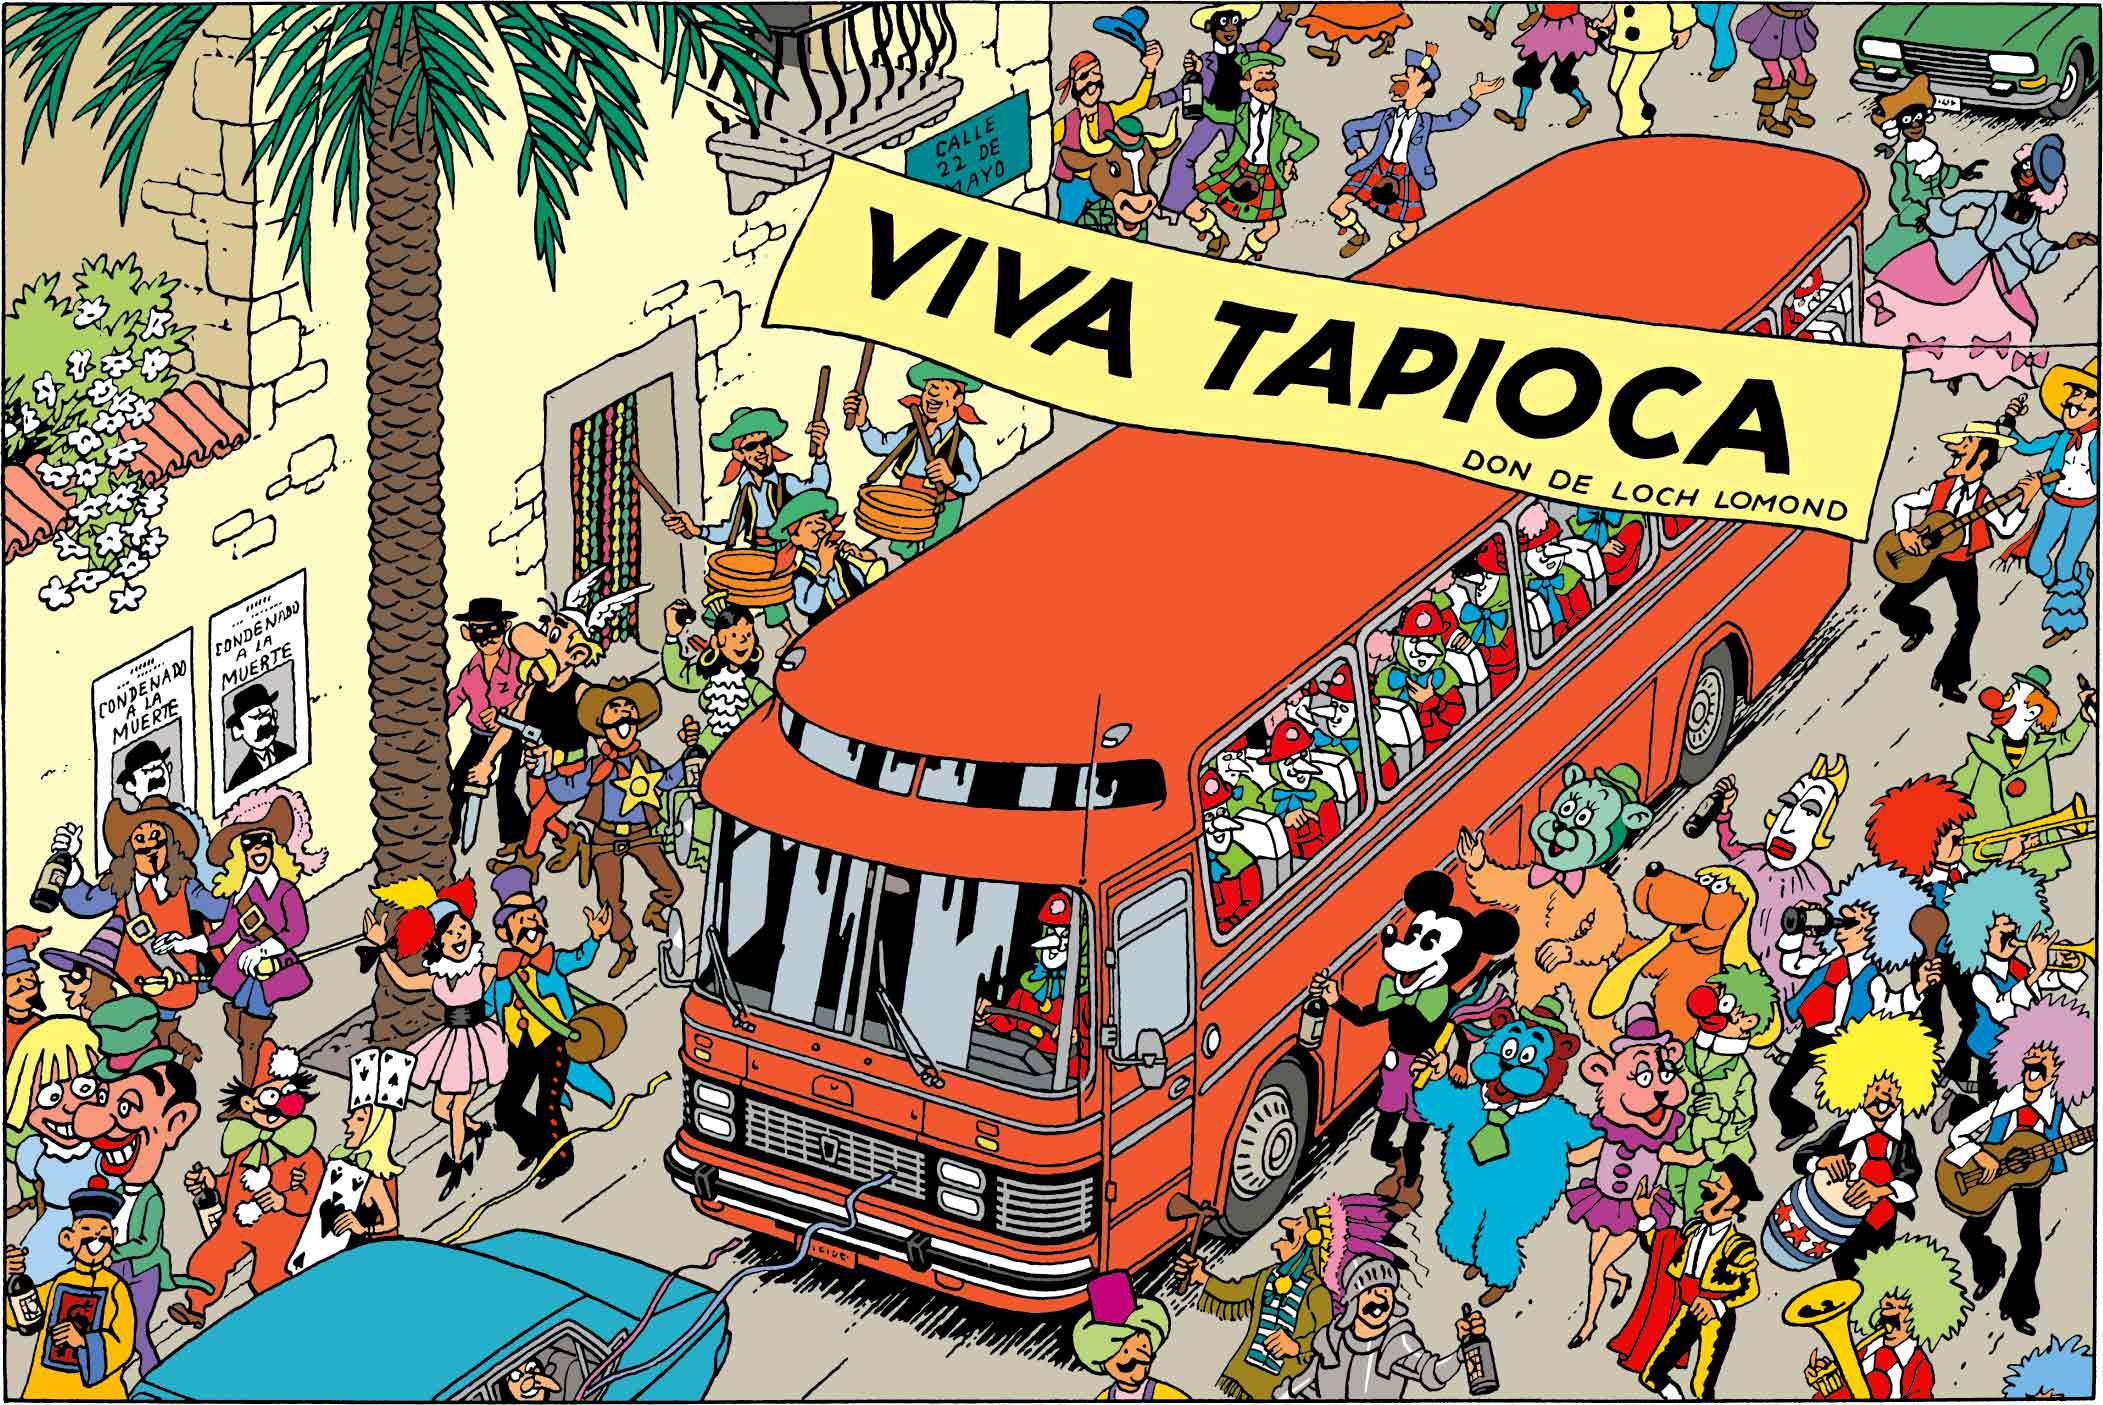 Tintin - Les Aventures de Tintin - Tintin et les Picaros - Asterix - Mickey